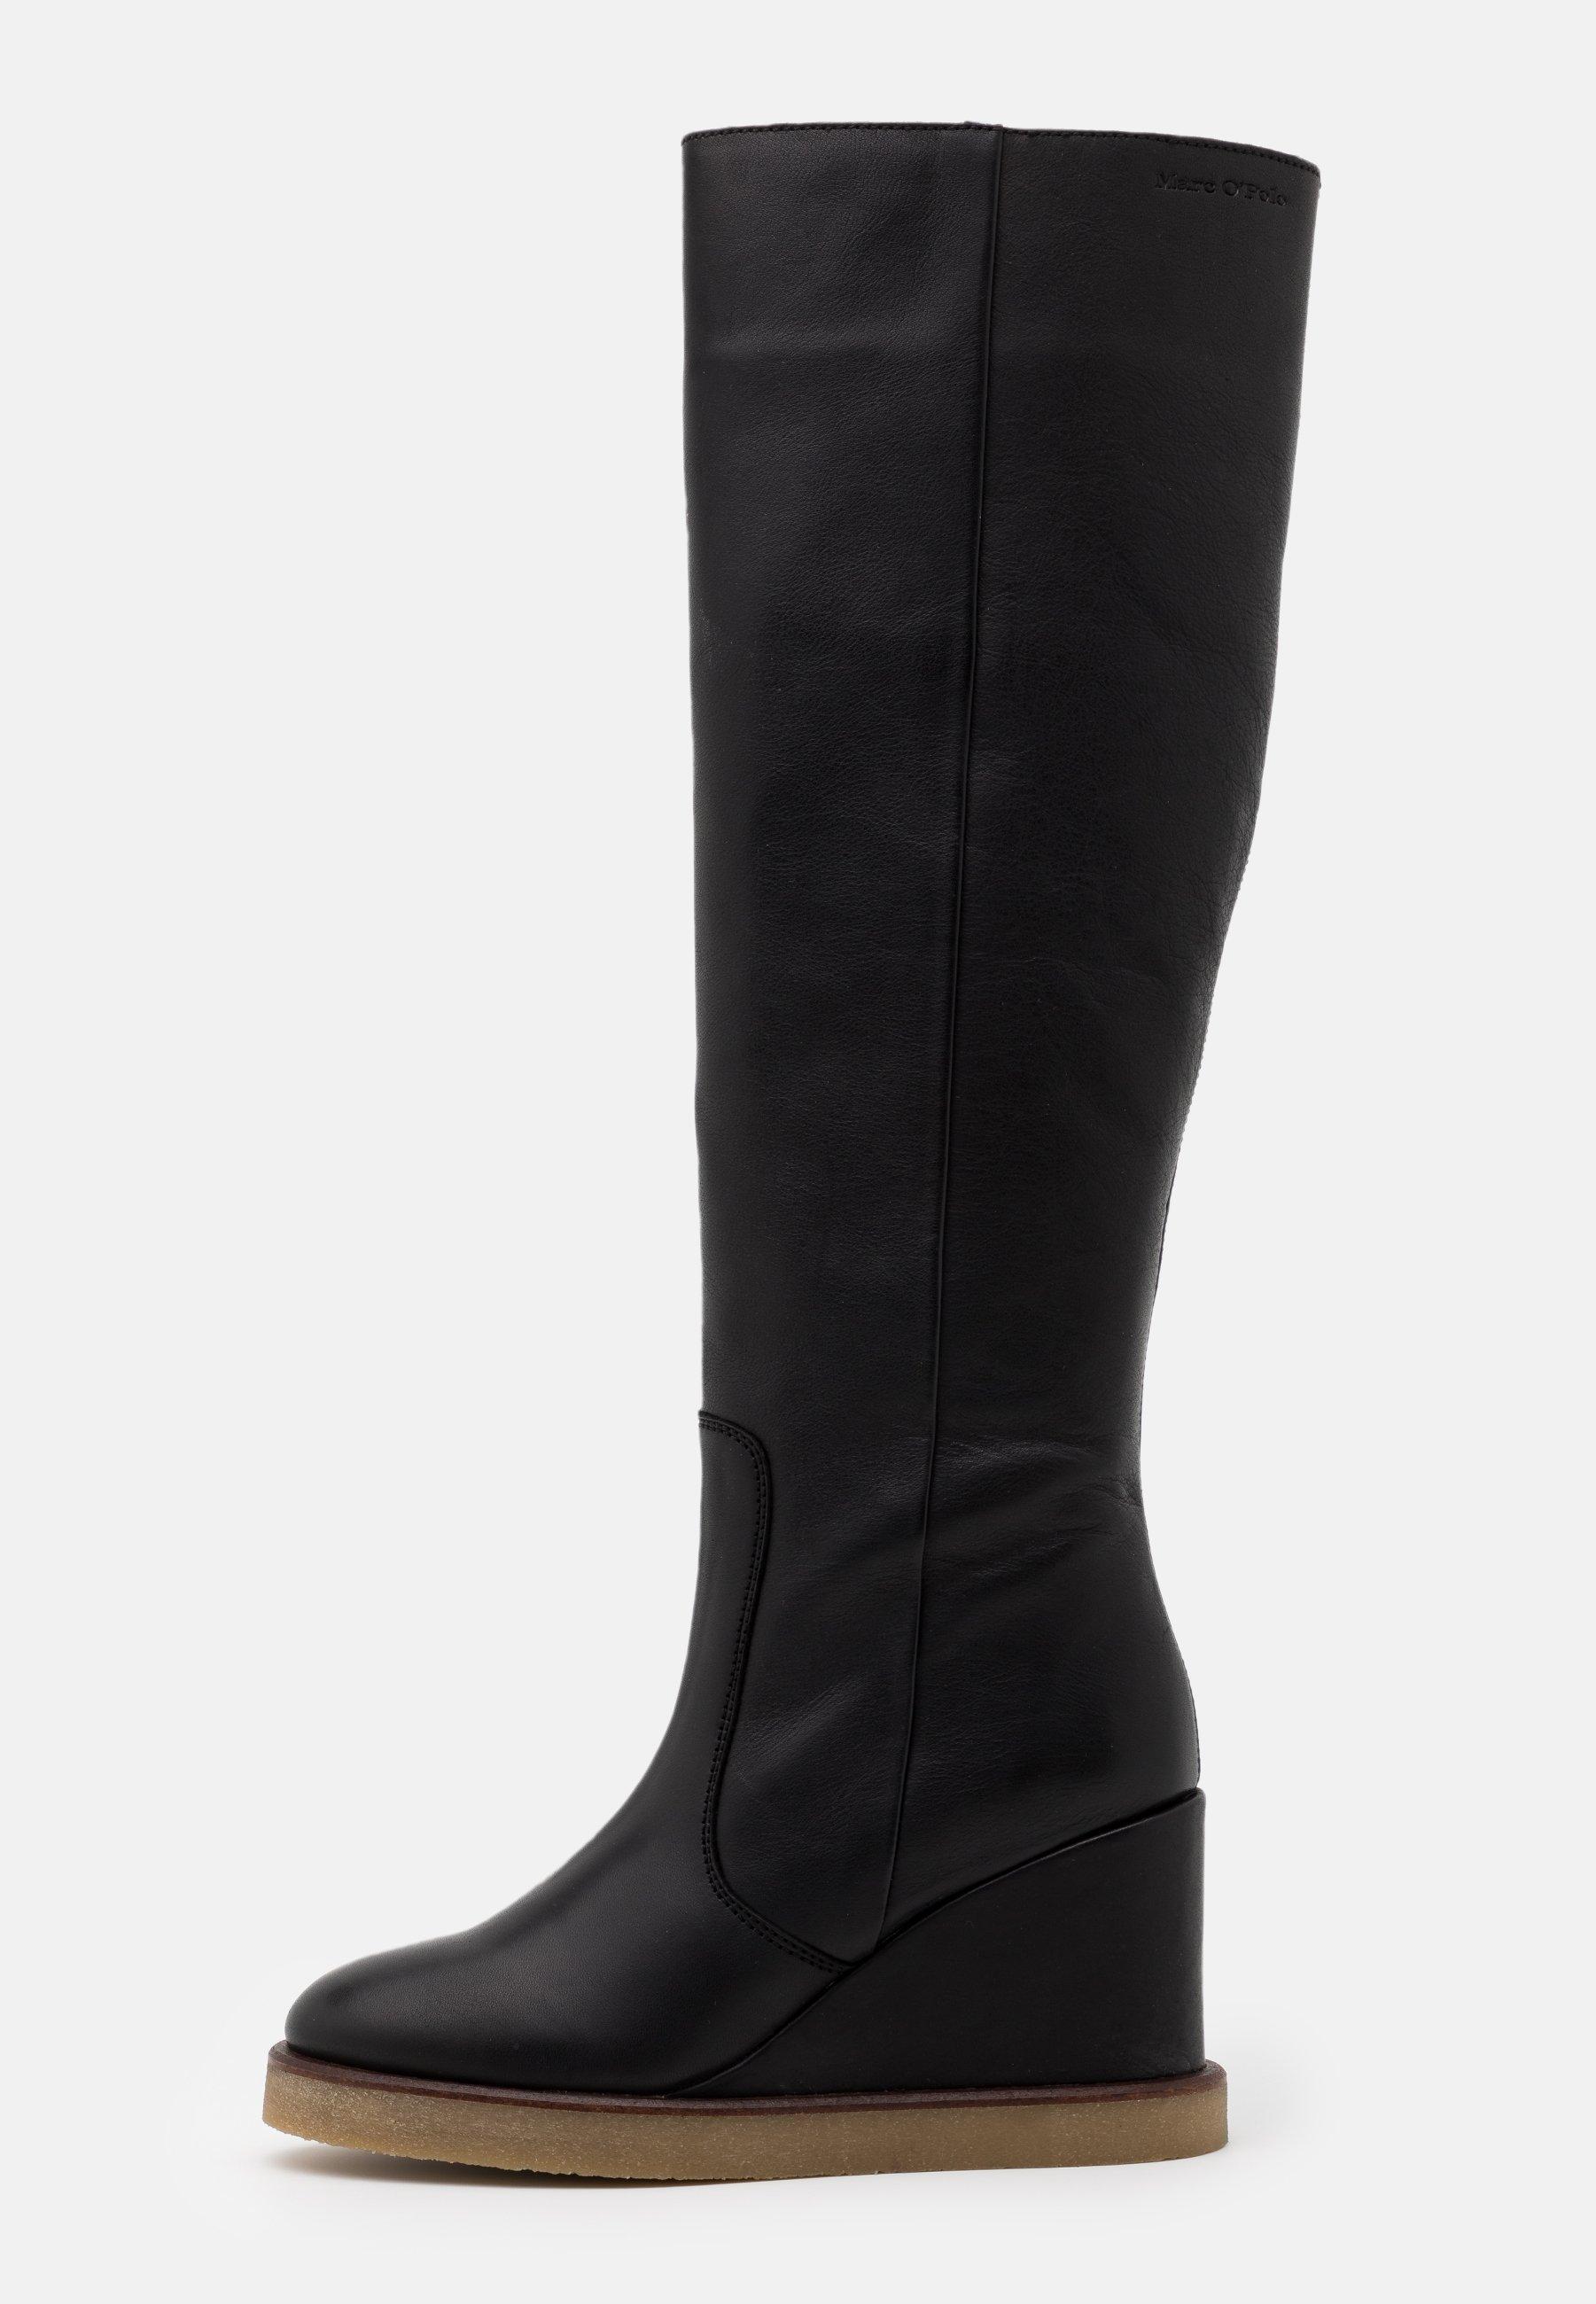 Sleehak laarzen outlet online kopen | ZALANDO | Laarzen